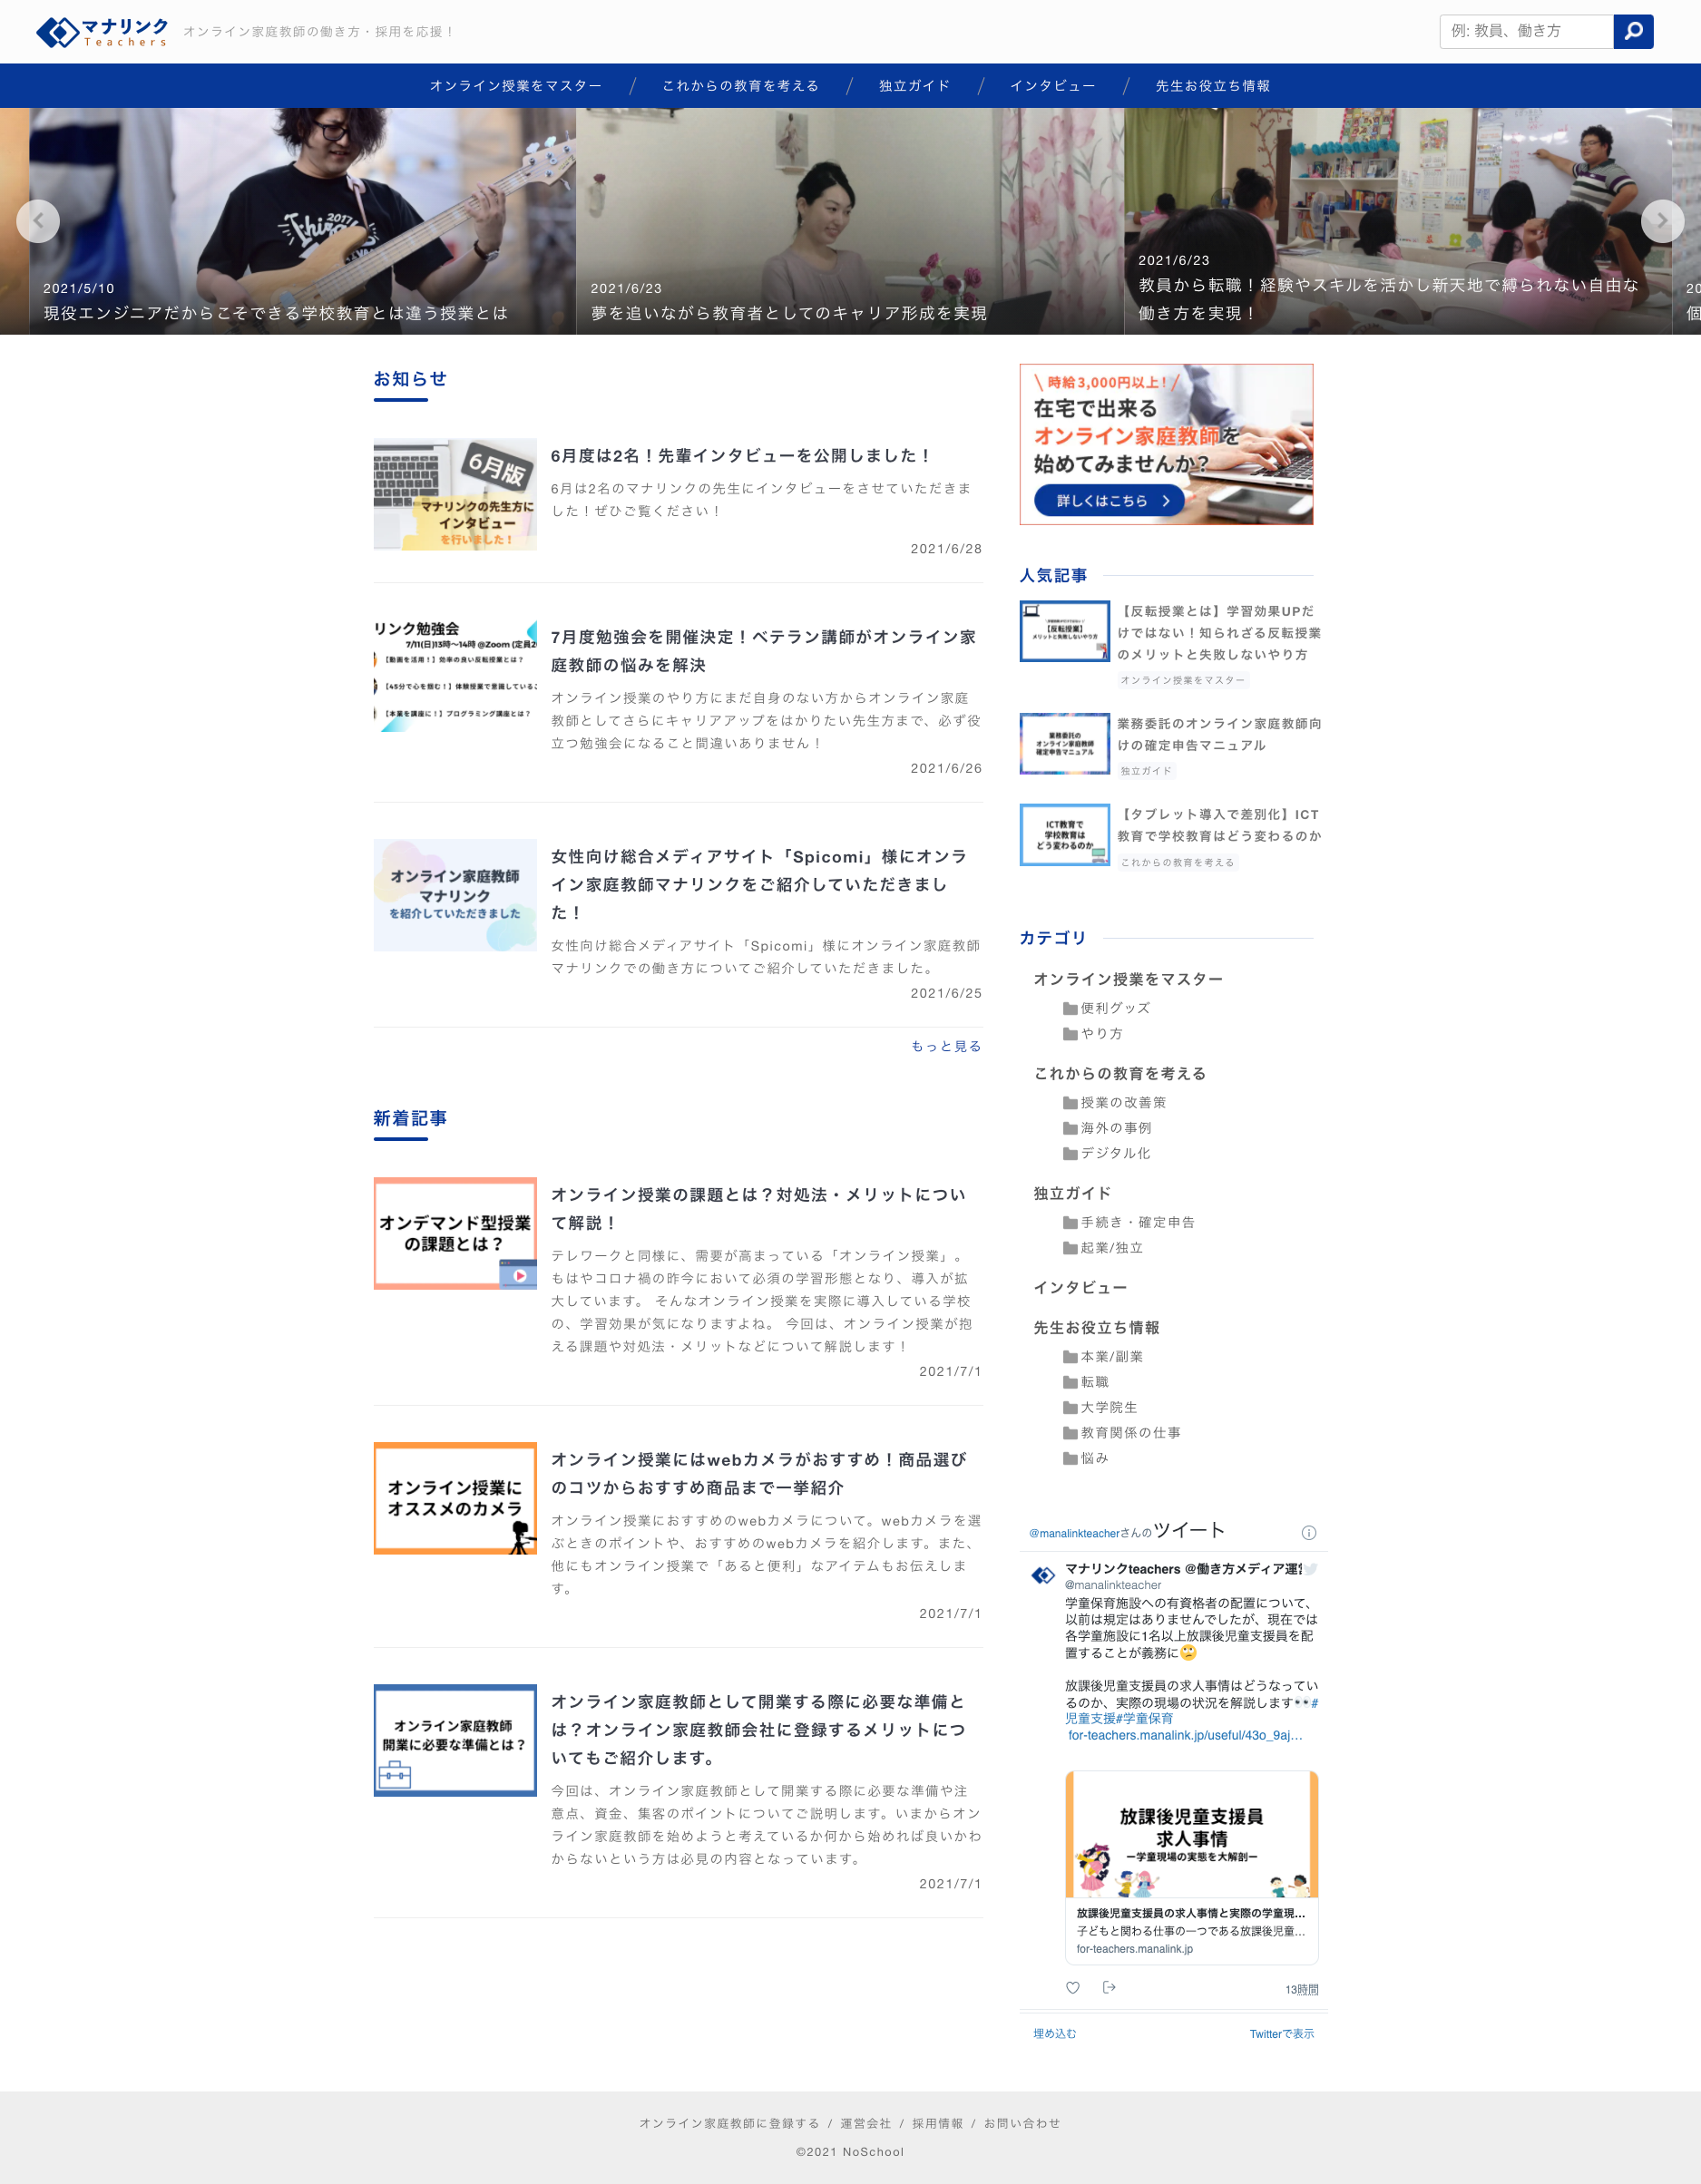 FireShot Capture 008 - マナリンクTeachers - オンライン家庭教師の働き方・採用を応援! - for-teachers manalink jp